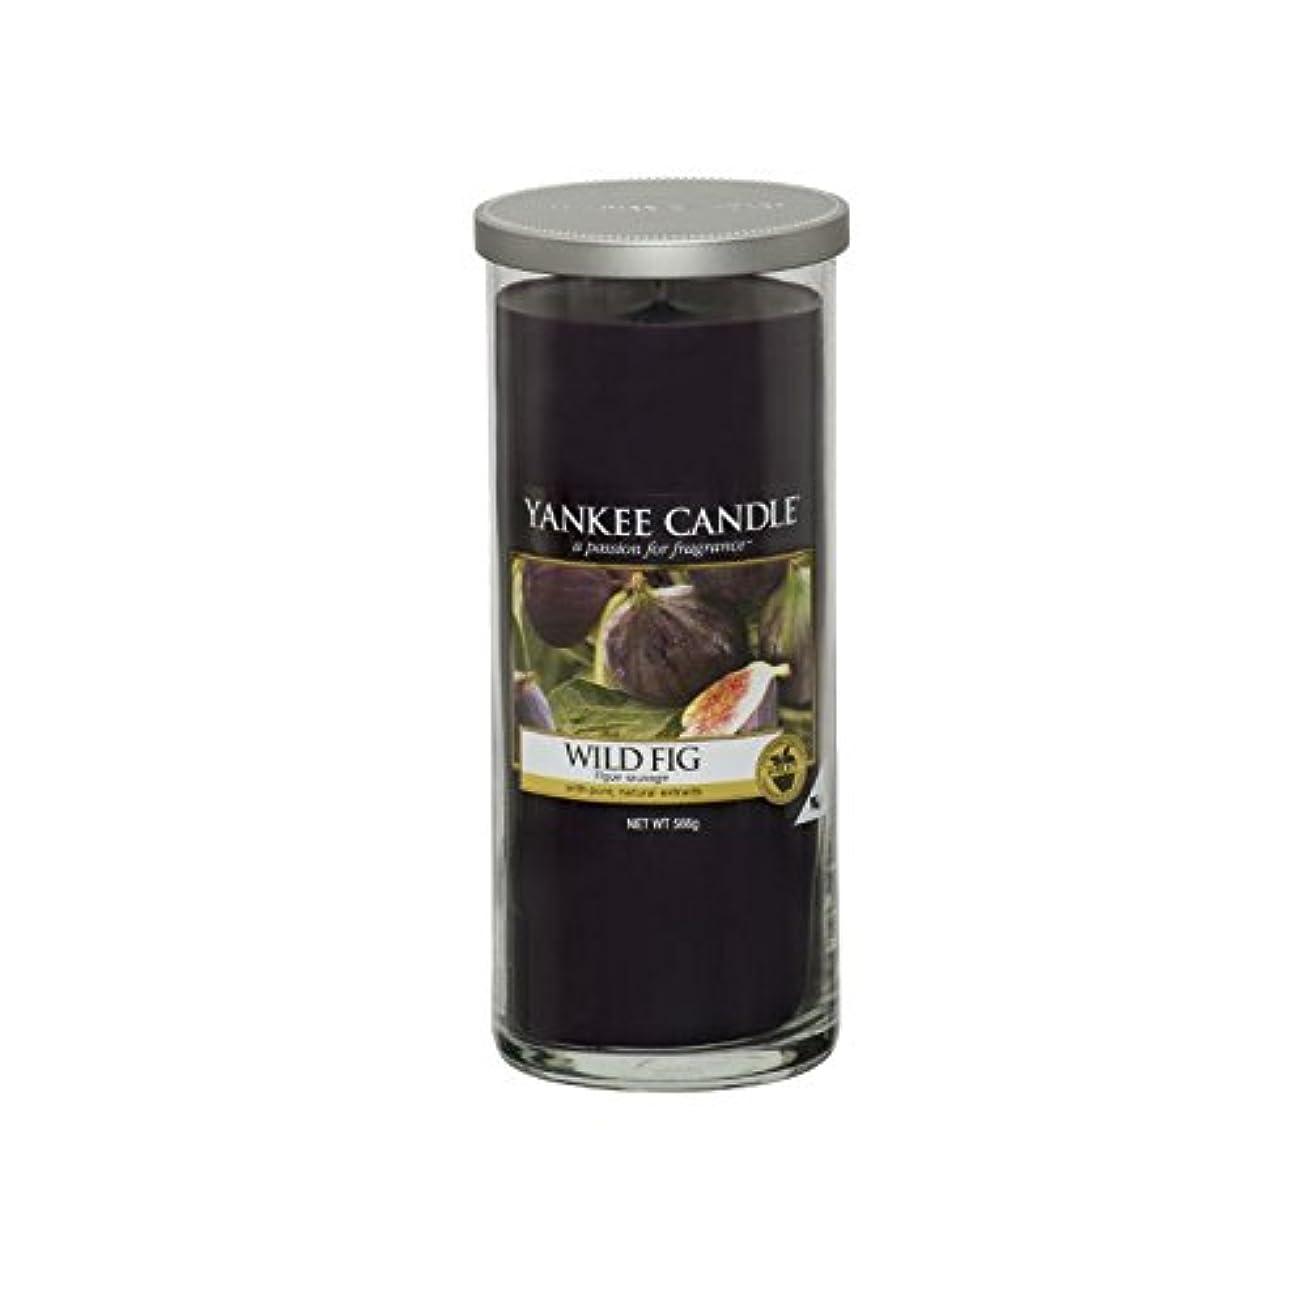 Yankee Candles Large Pillar Candle - Wild Fig (Pack of 6) - ヤンキーキャンドル大きな柱キャンドル - 野生のイチジク (x6) [並行輸入品]